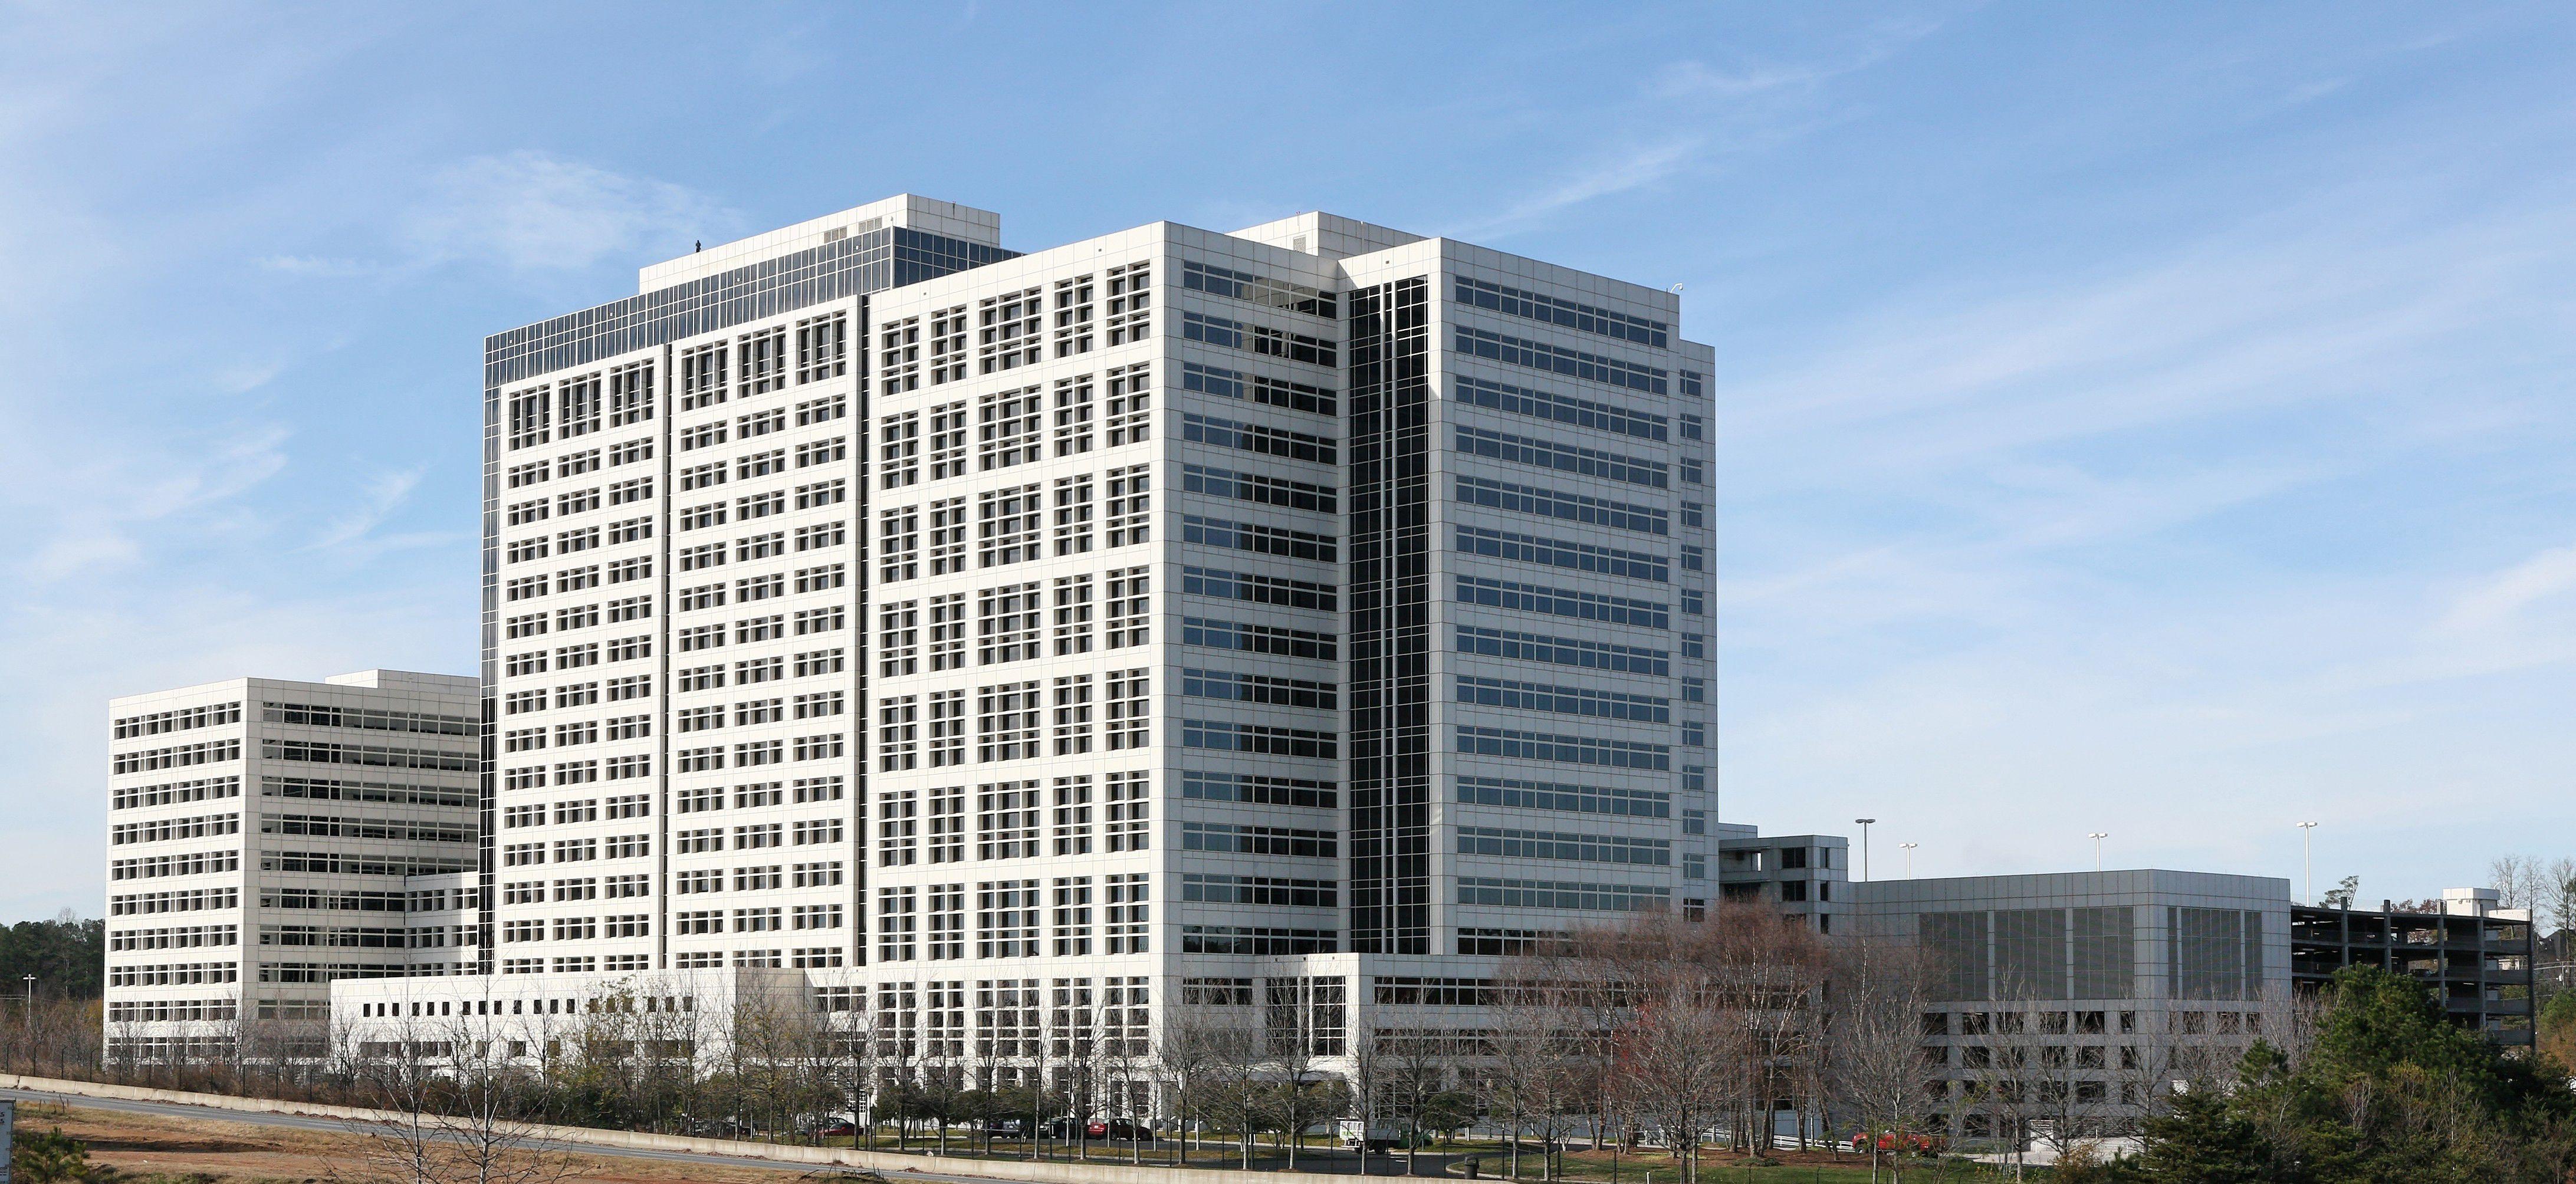 Fortune 500 Companies Headquartered in Atlanta, Georgia